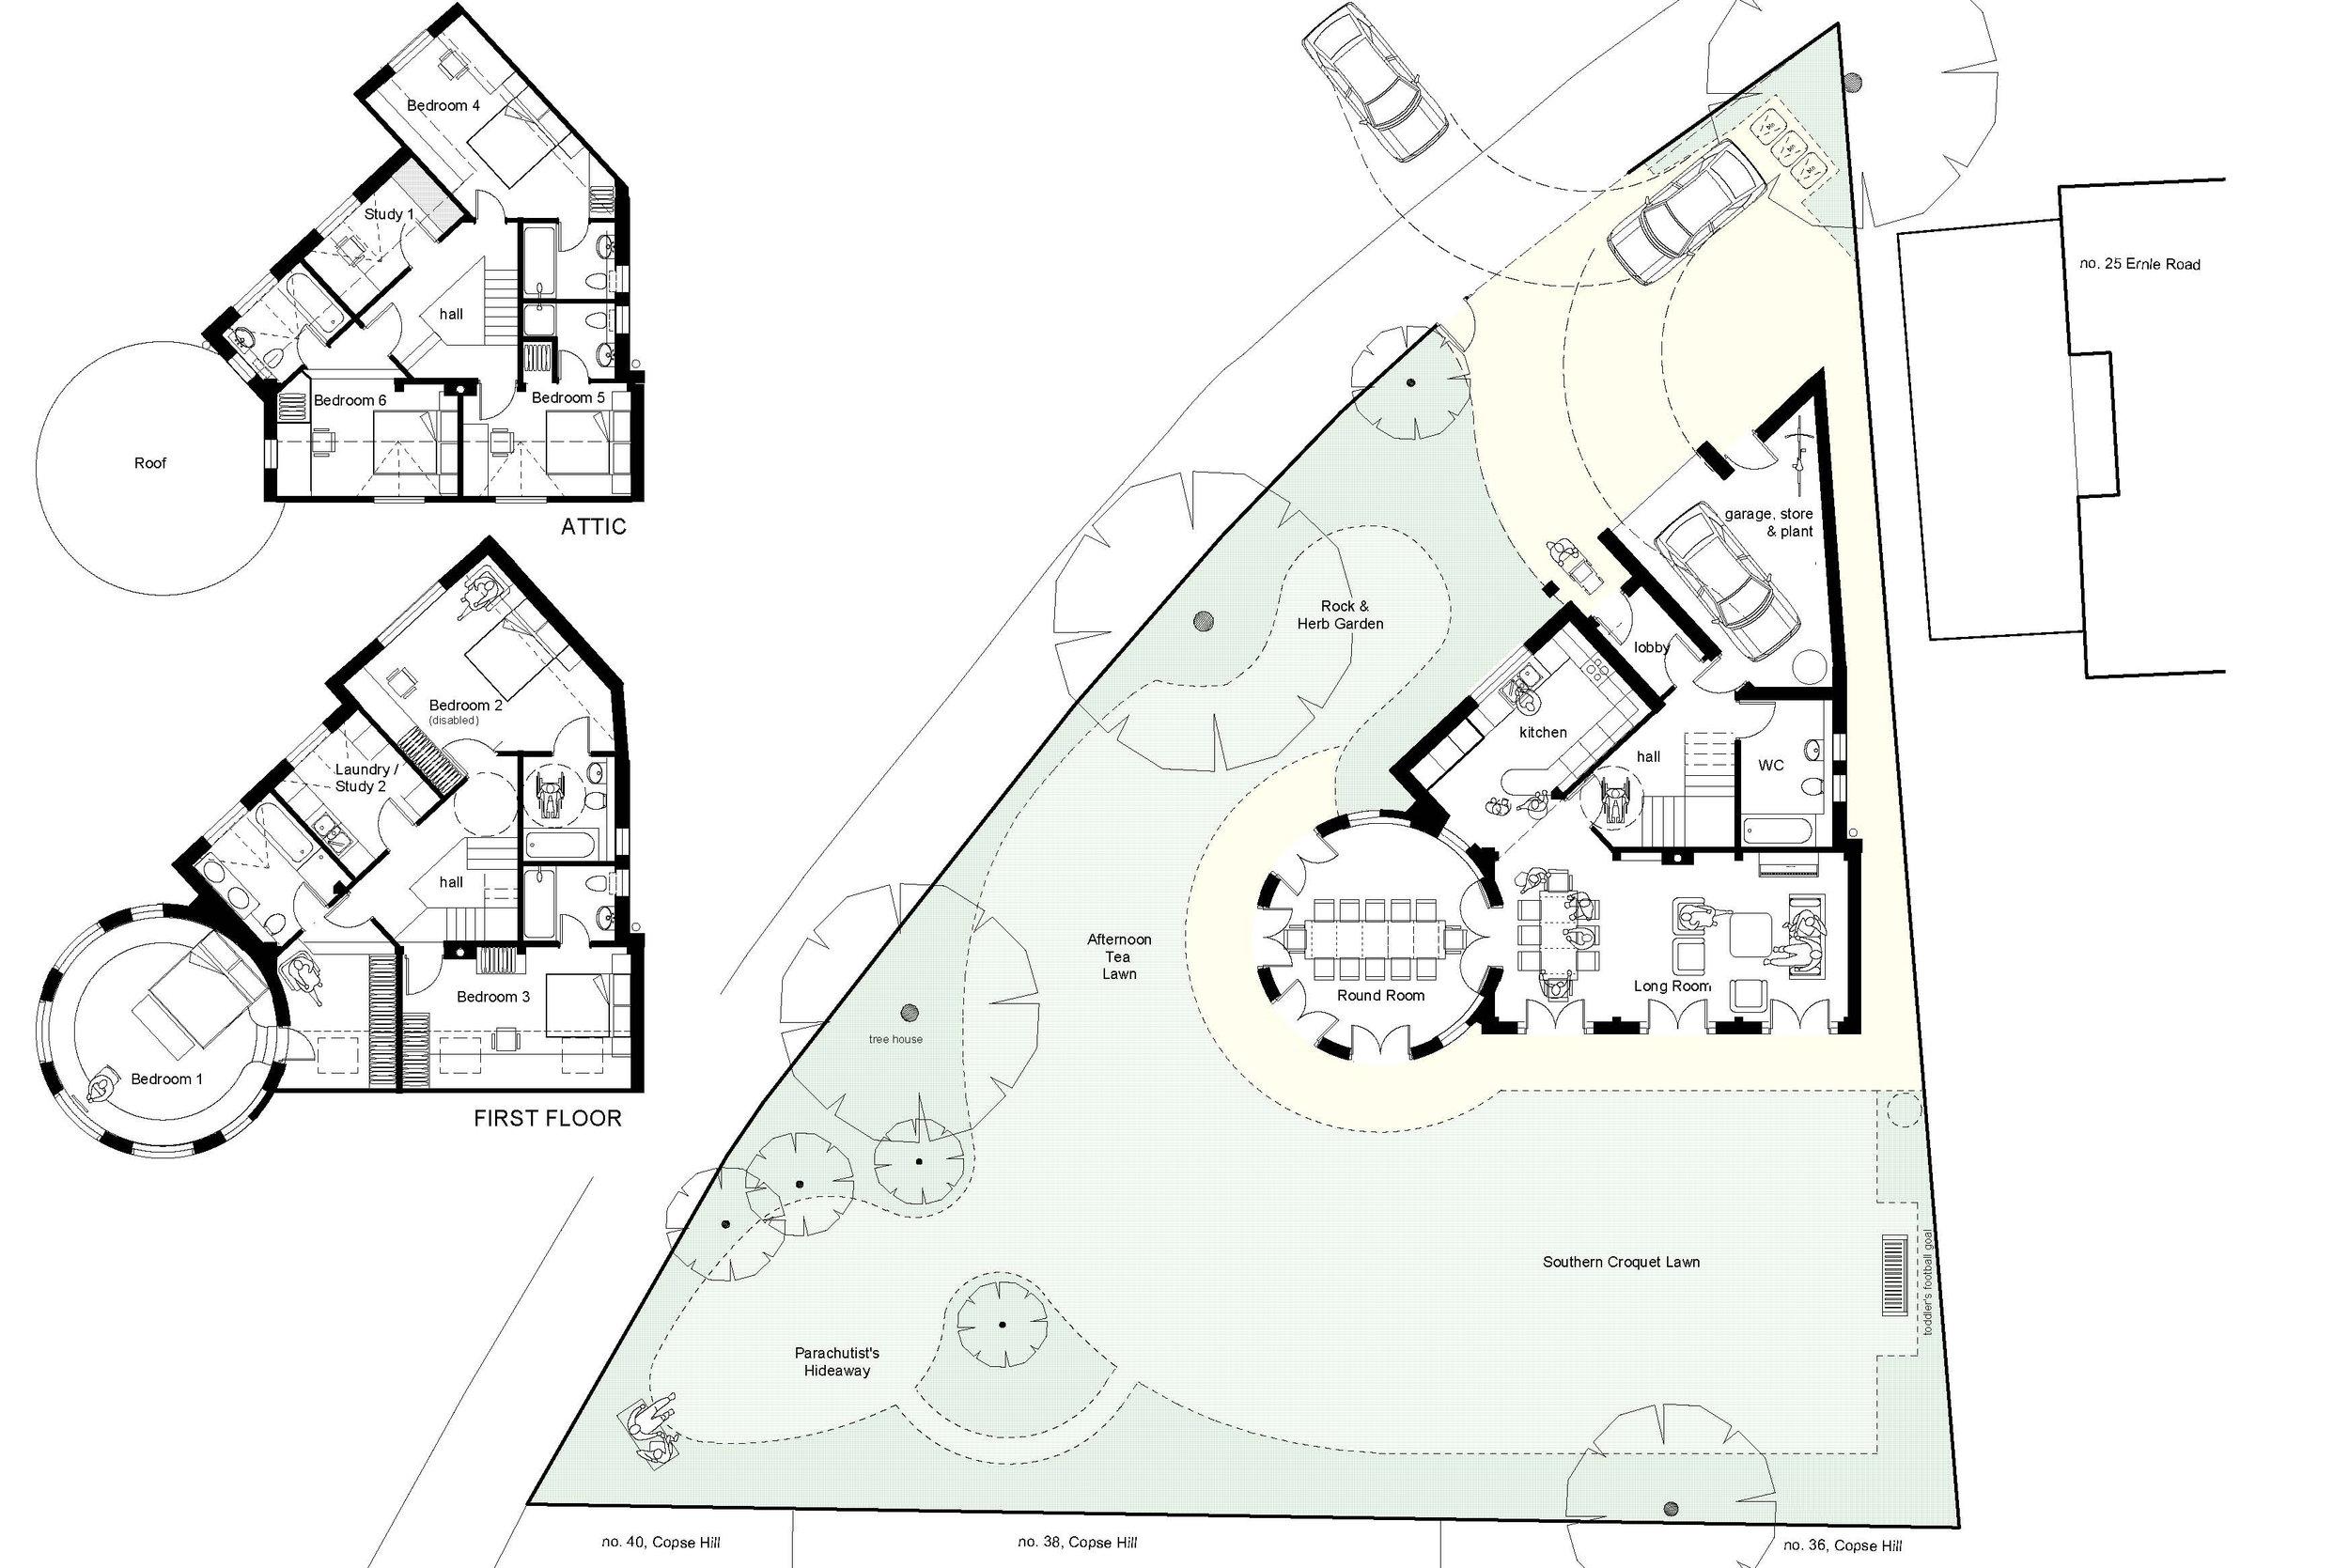 FINEarchitecture_ErnleRoad_Plans_01.jpg